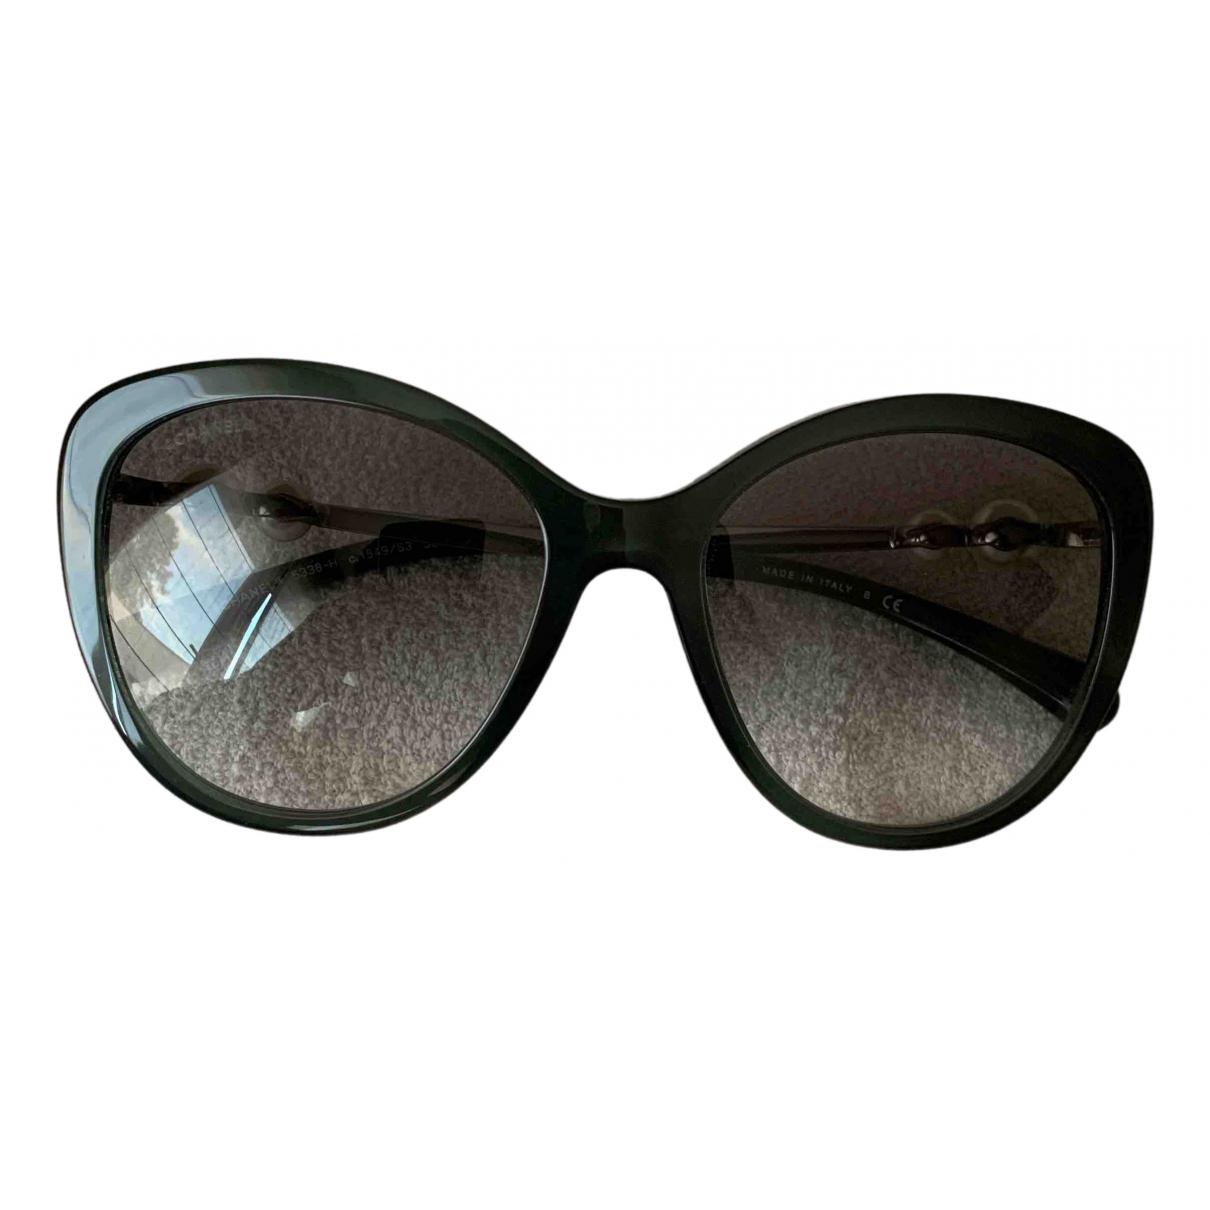 Chanel \N Khaki Sunglasses for Women \N